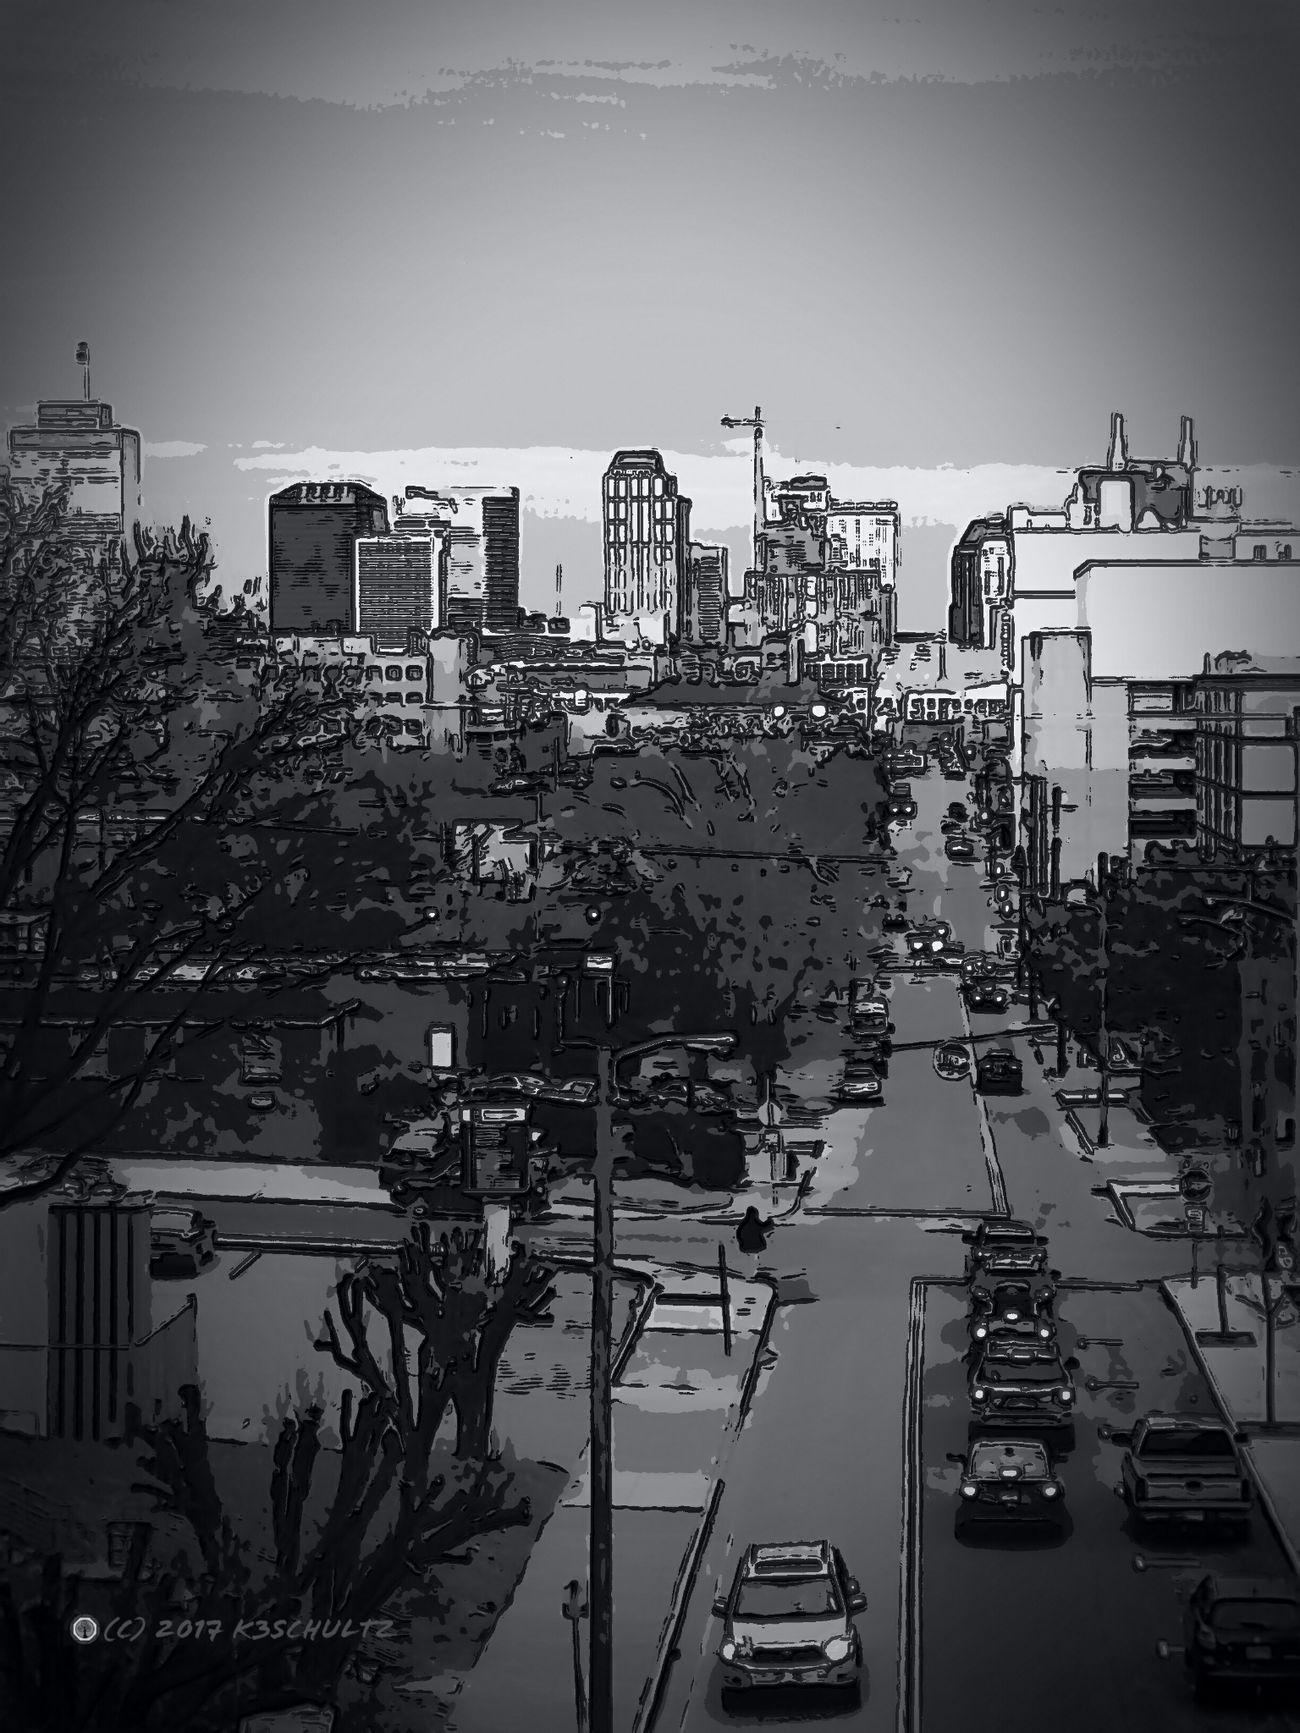 Day 9: Artistic Cityscape 365DaysOfAwesomeness PhotographyProject Black & White Cityscape Day 9 Artistic Expression